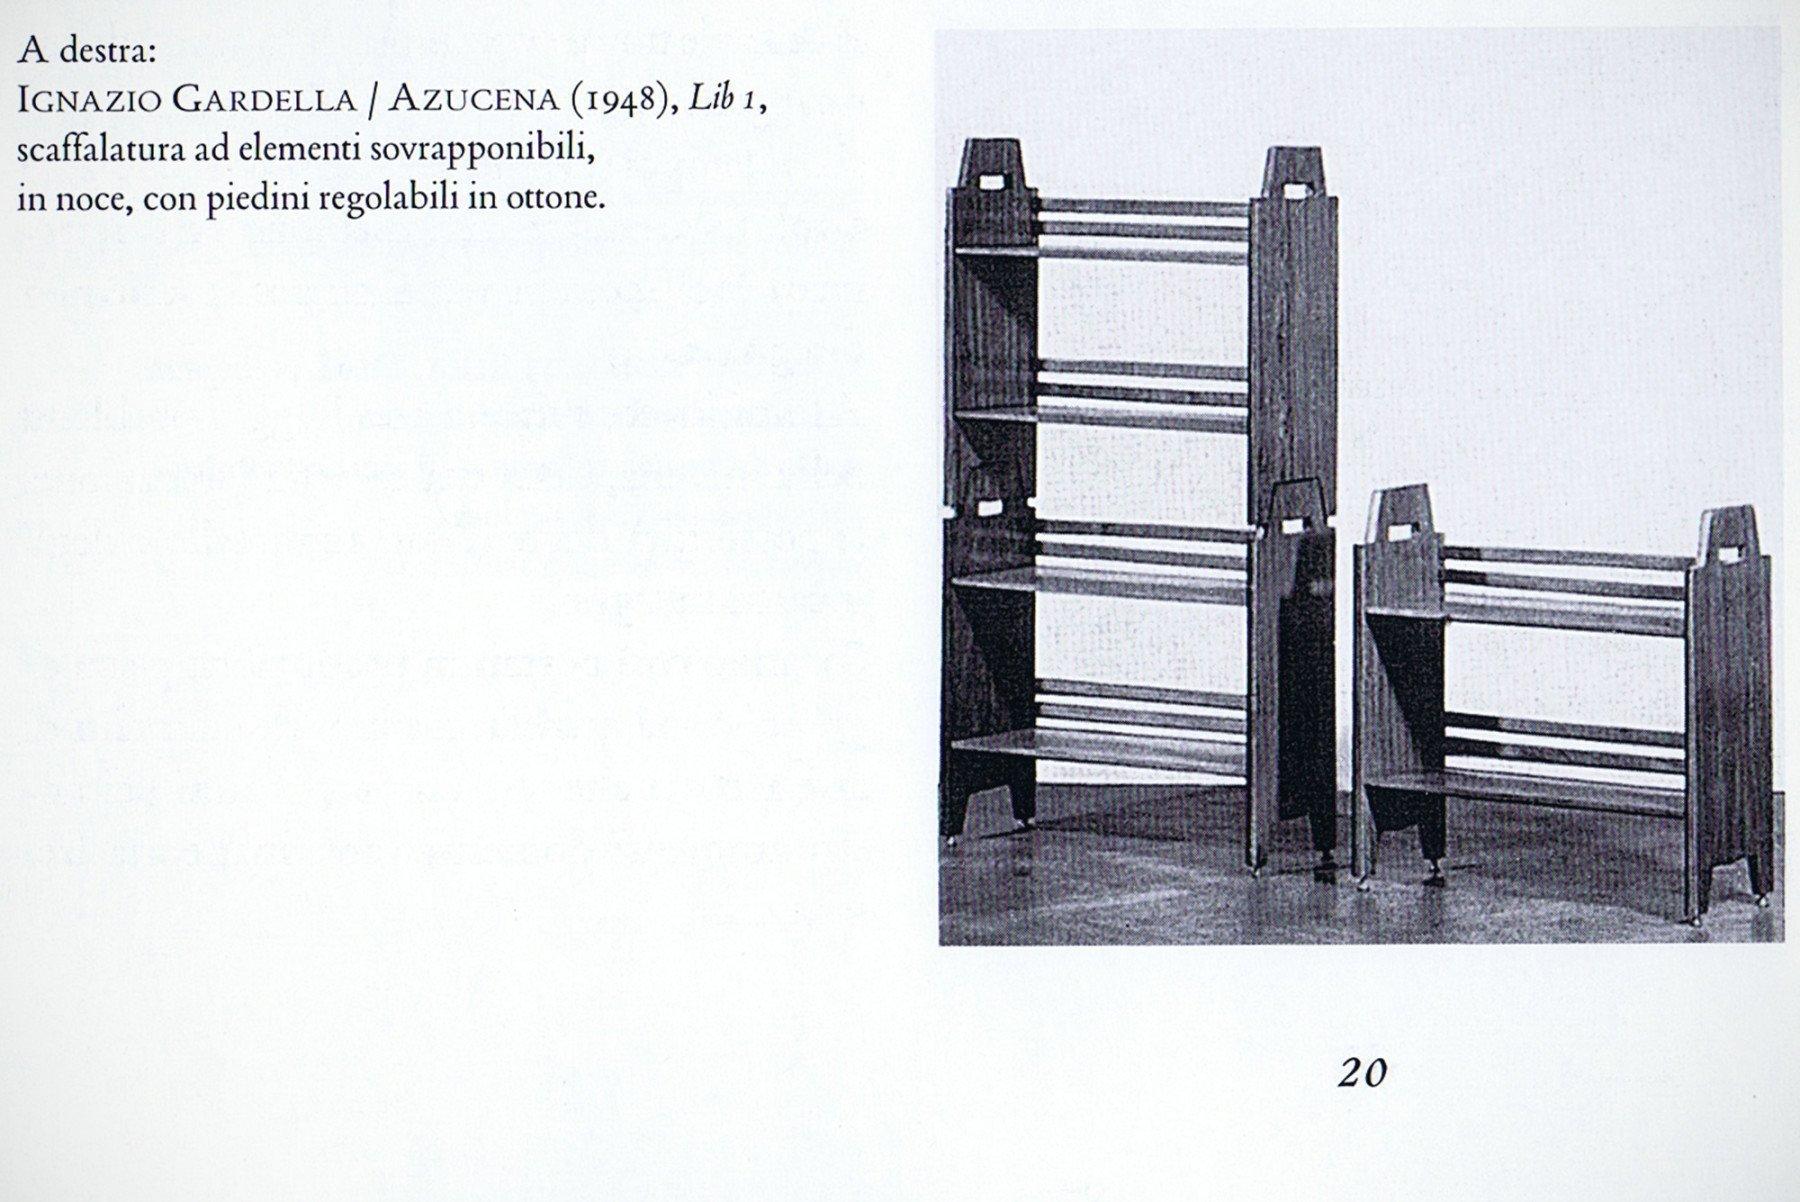 Ignazio Gardella |   Shelving unit, lib 1